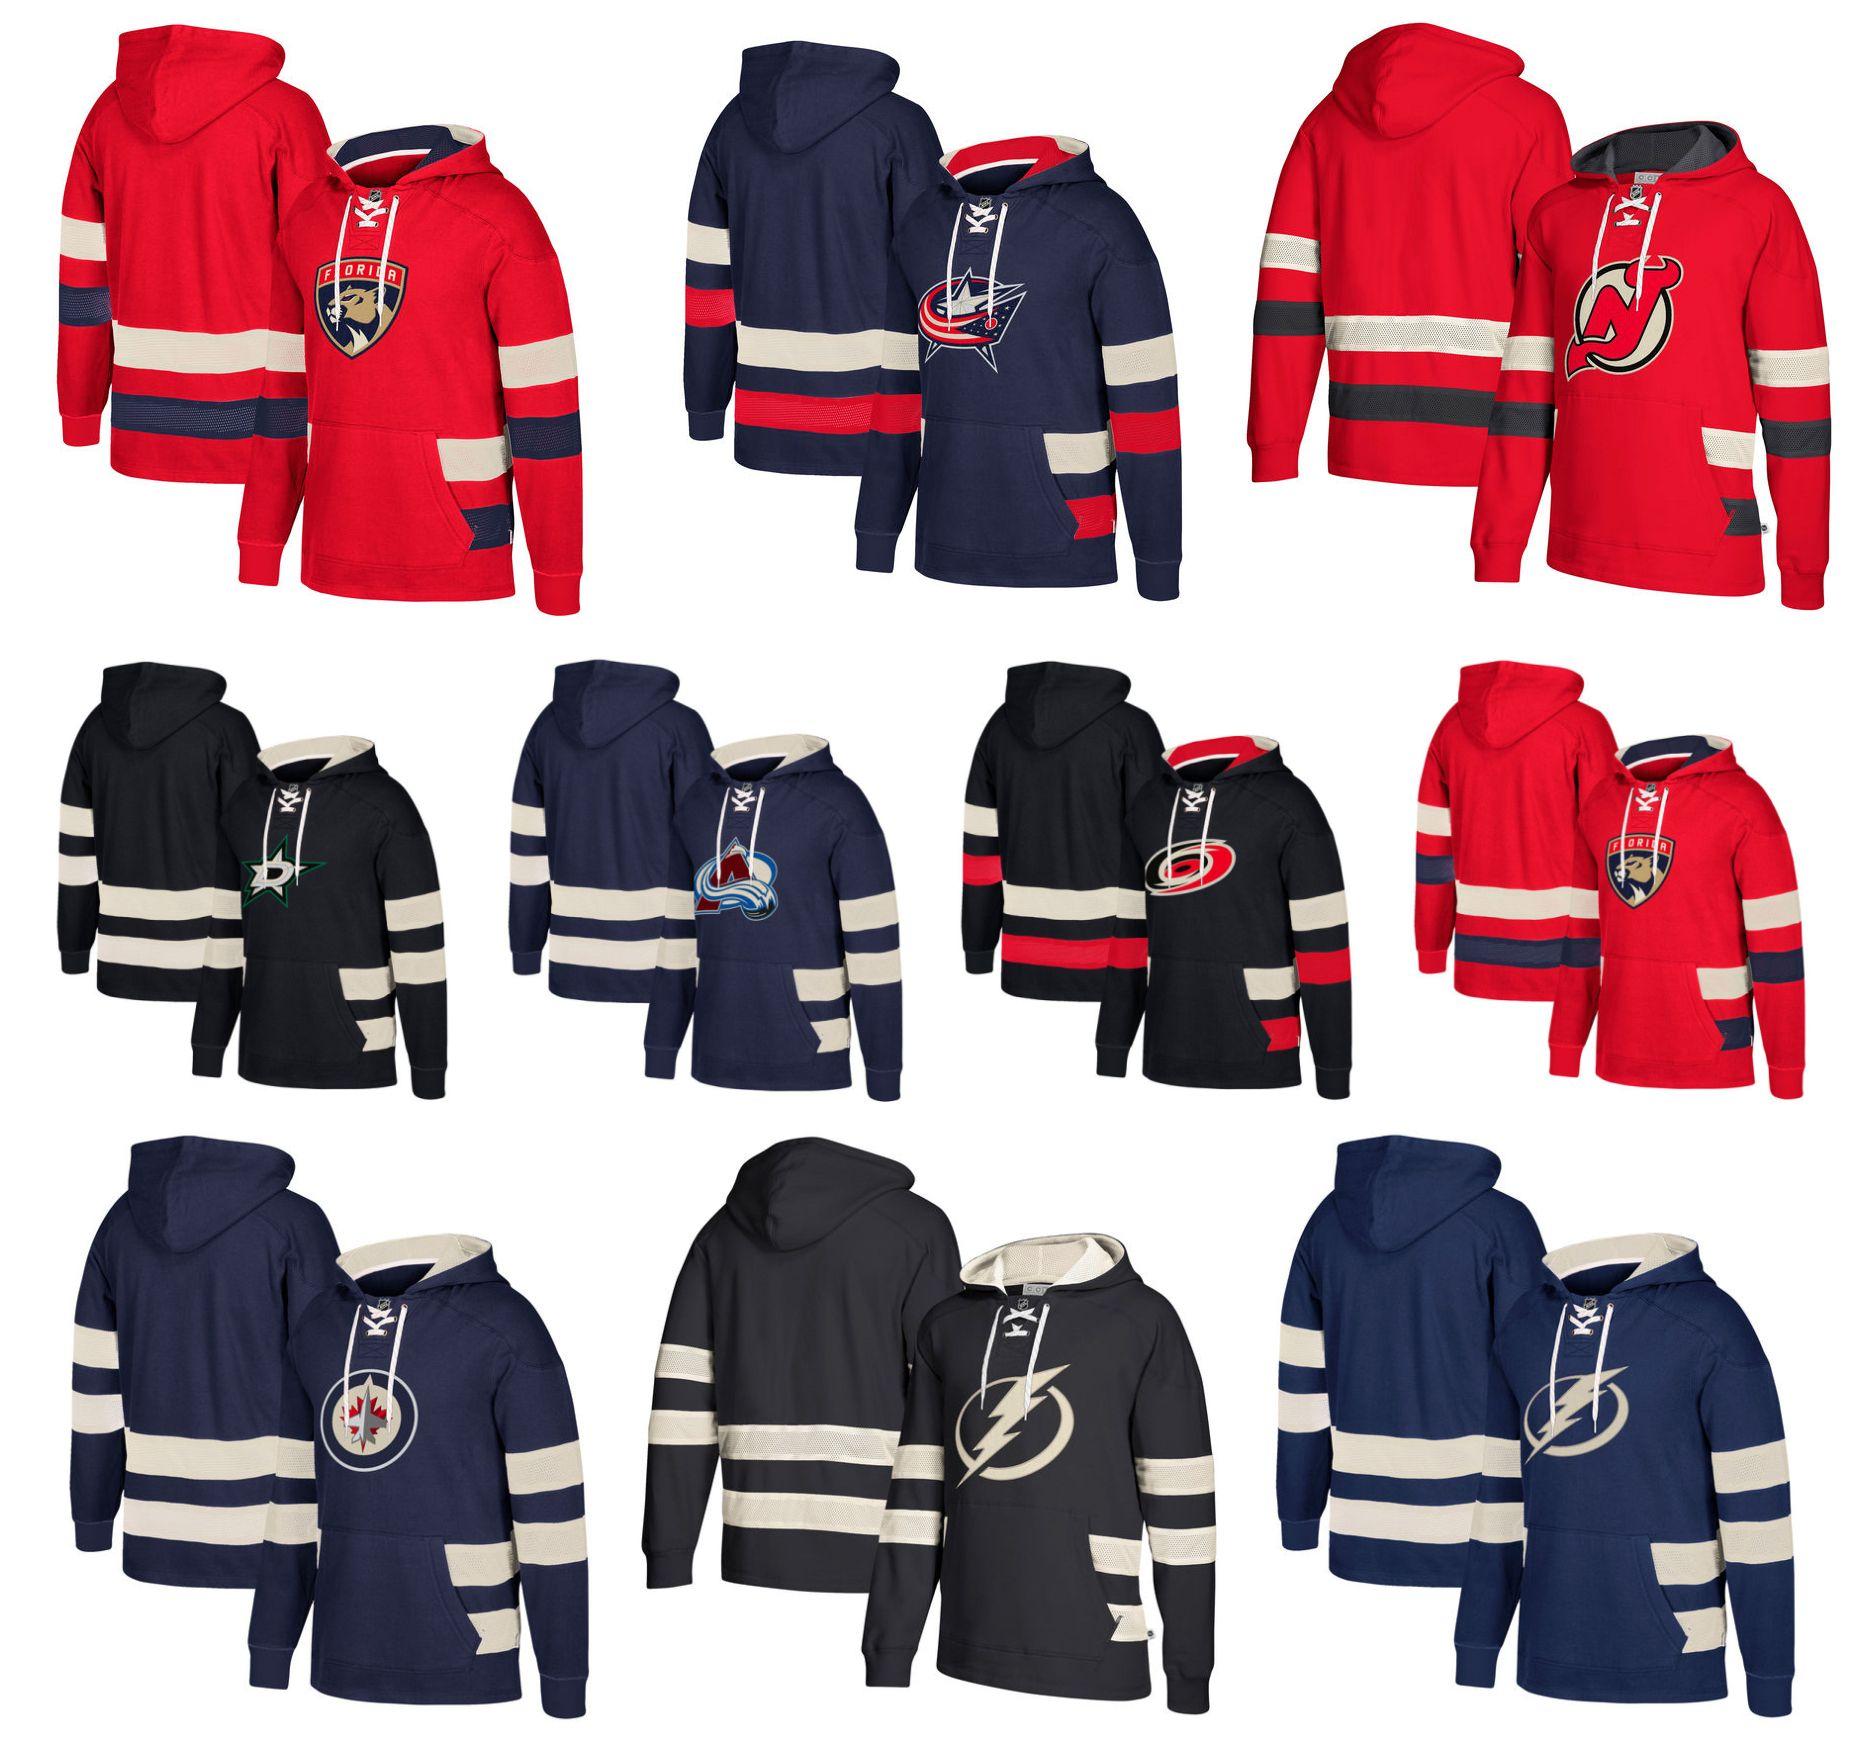 huge discount 5e9b5 53f41 Kundenspezifischer Hockey-Hoodie-Pullover  Winnipeg-Jet-Dallas-Stern-New-Jersey Teufel Columbus-blaue  Jacken-Tampa-Bucht-Blitz Carolina-Hurrikane